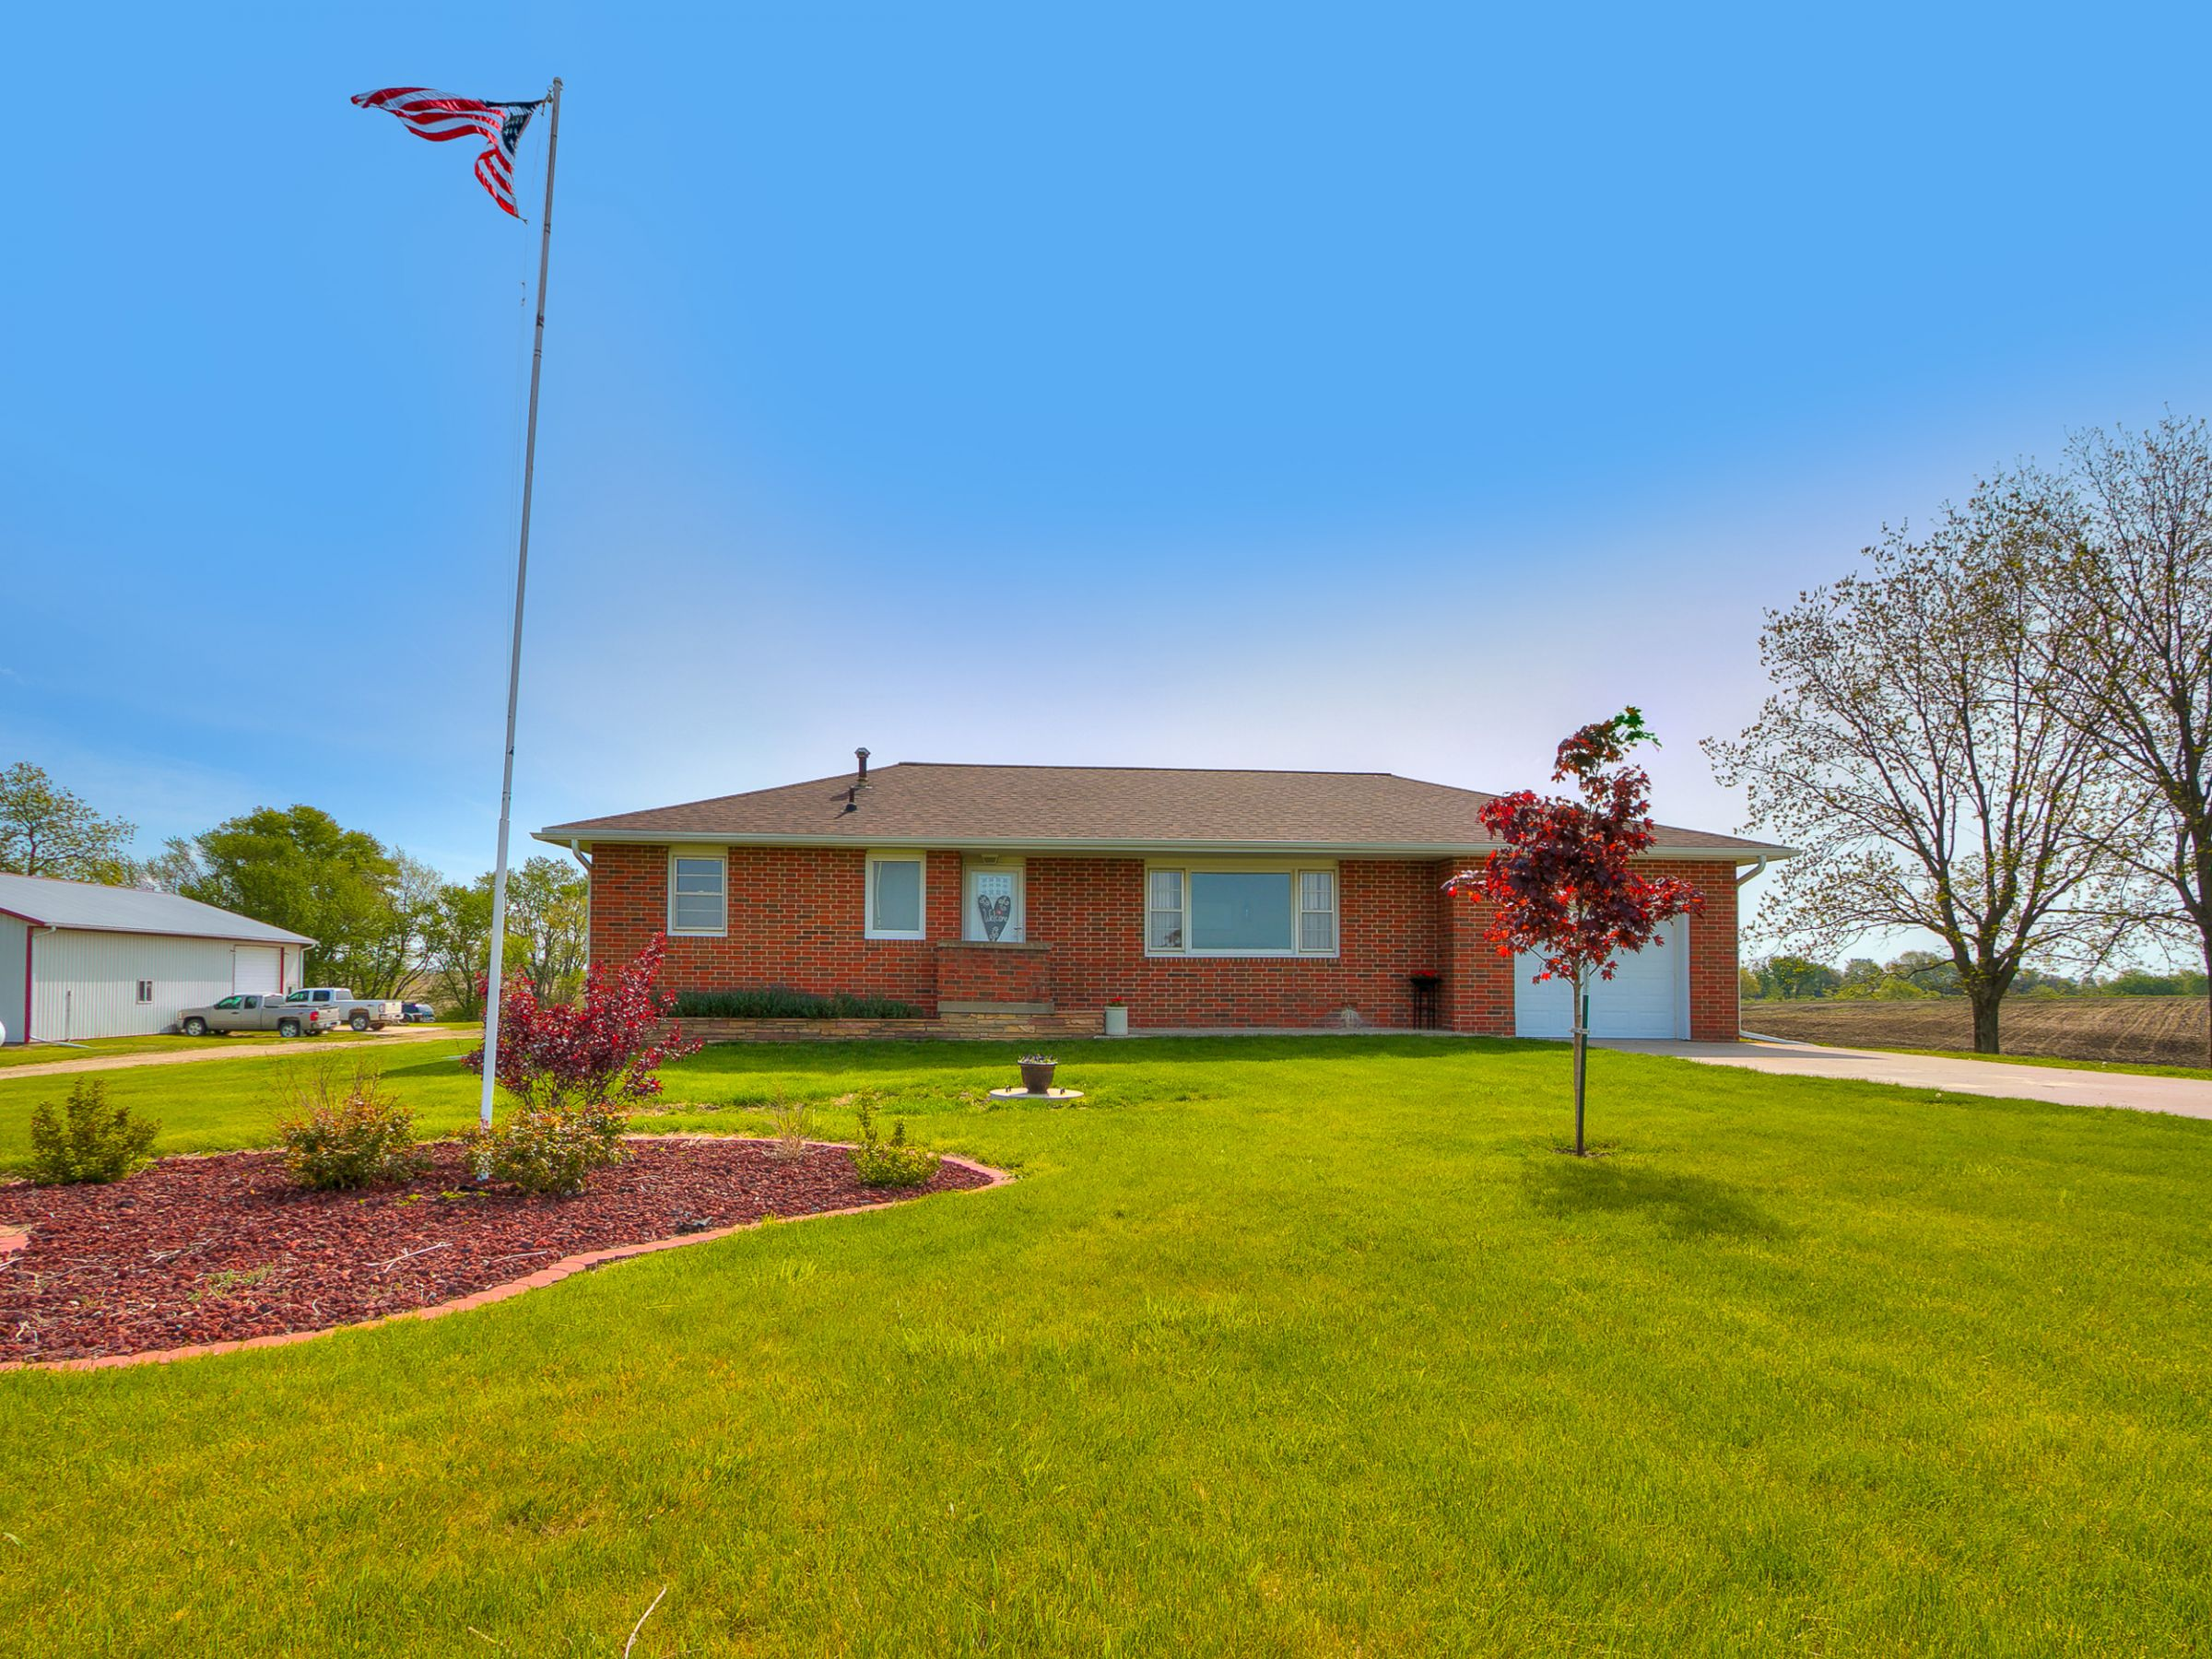 residential-warren-county-iowa-3-acres-listing-number-15516-4-2021-05-12-144635.jpg